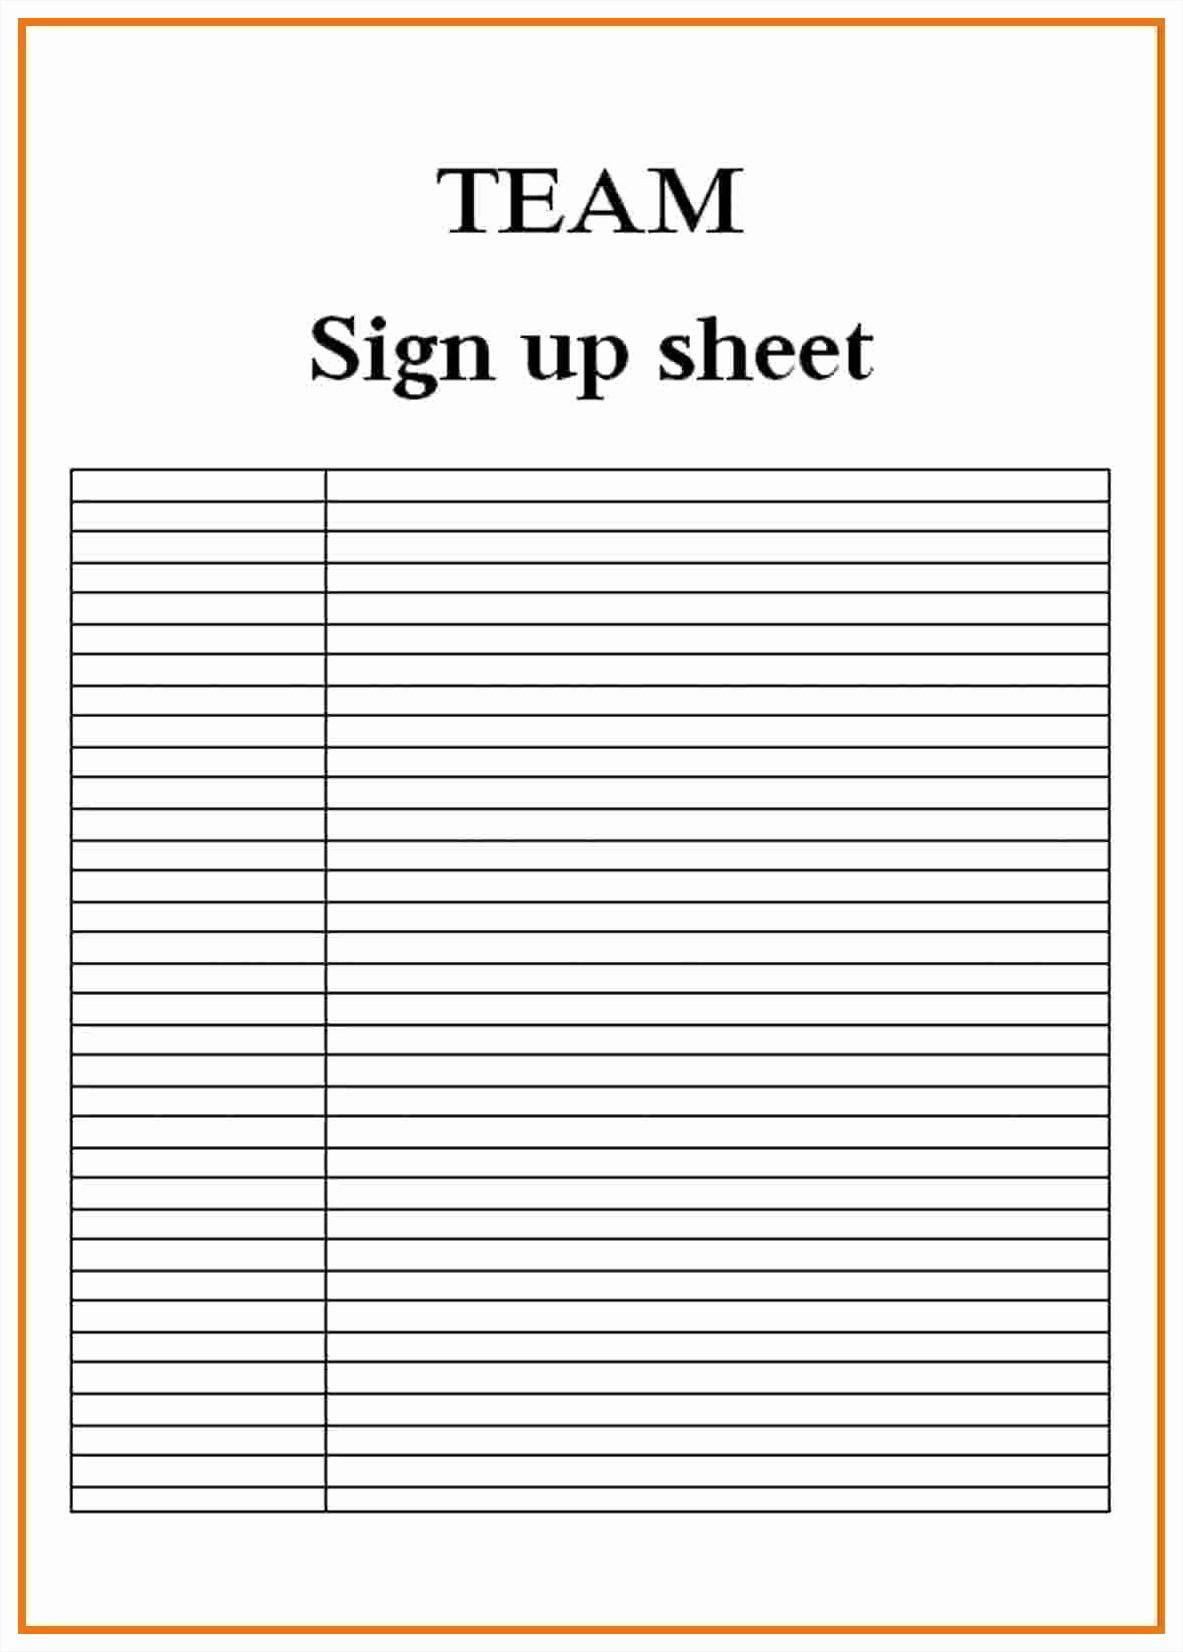 Blank Sign Up Sheet Template Inspirational Blank Sign Up Sheet Example Mughals